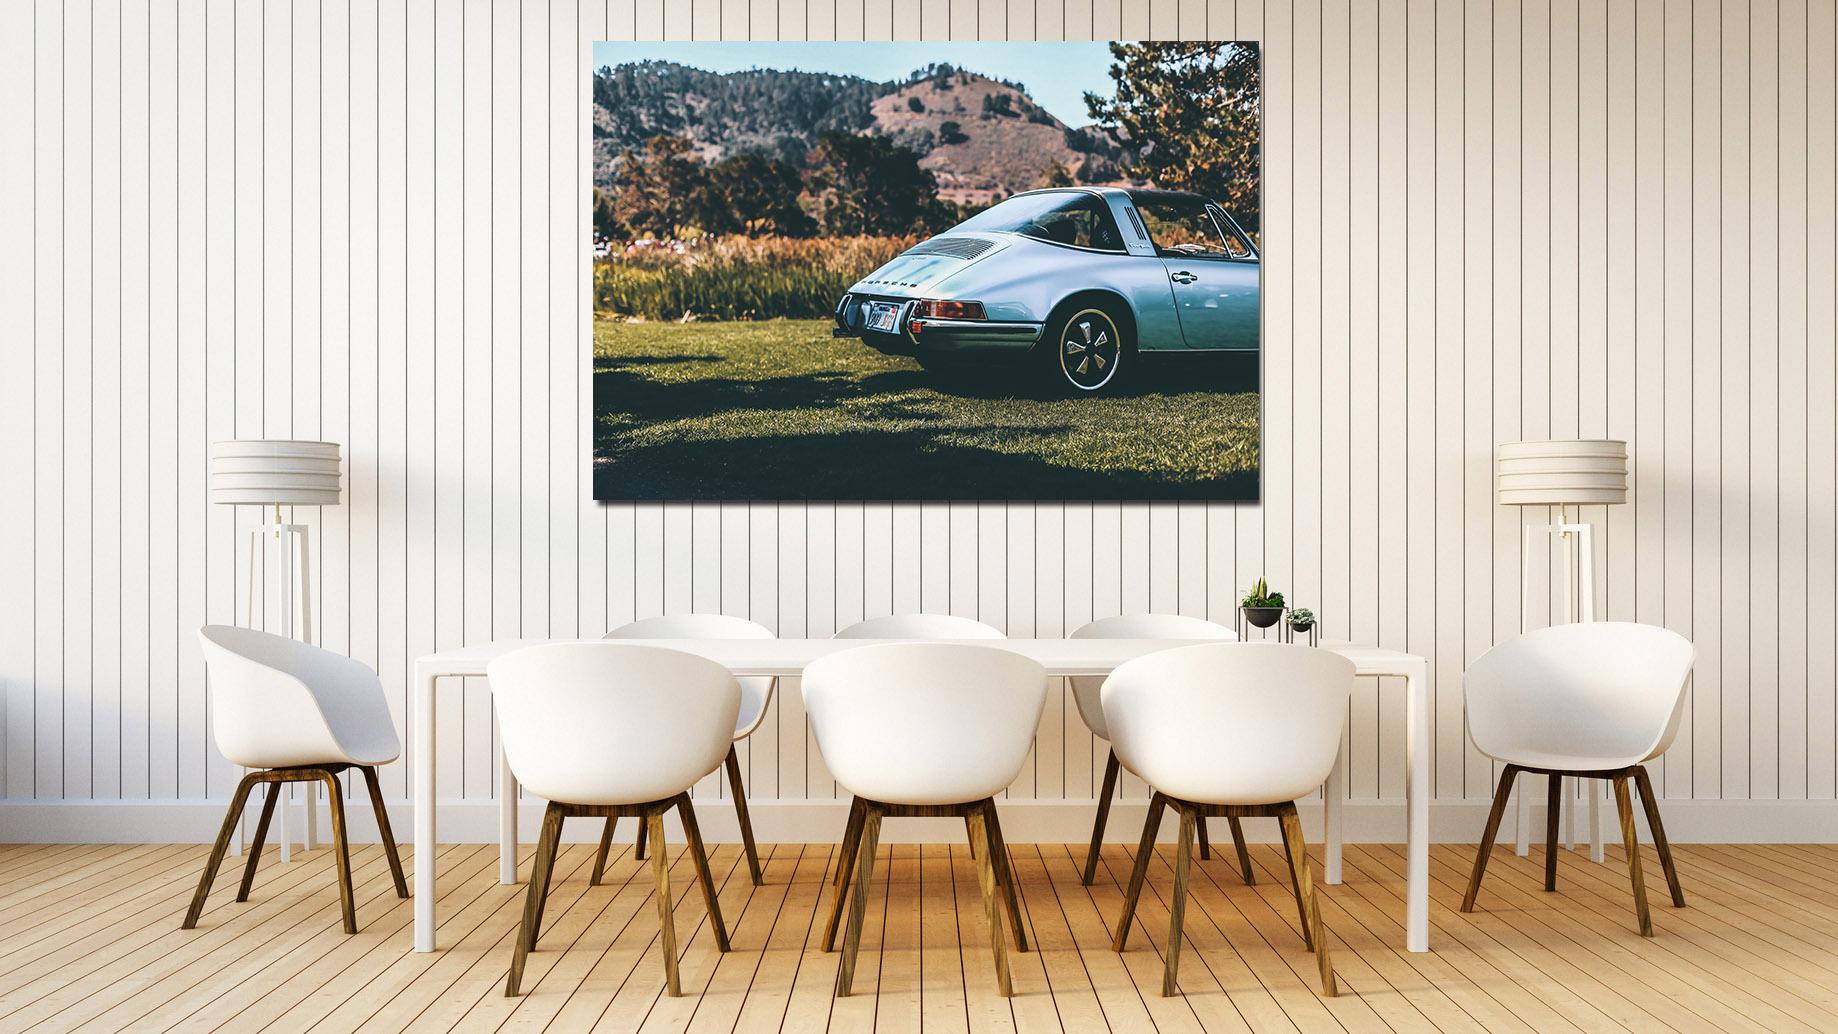 Old Porsche 911 Photographs